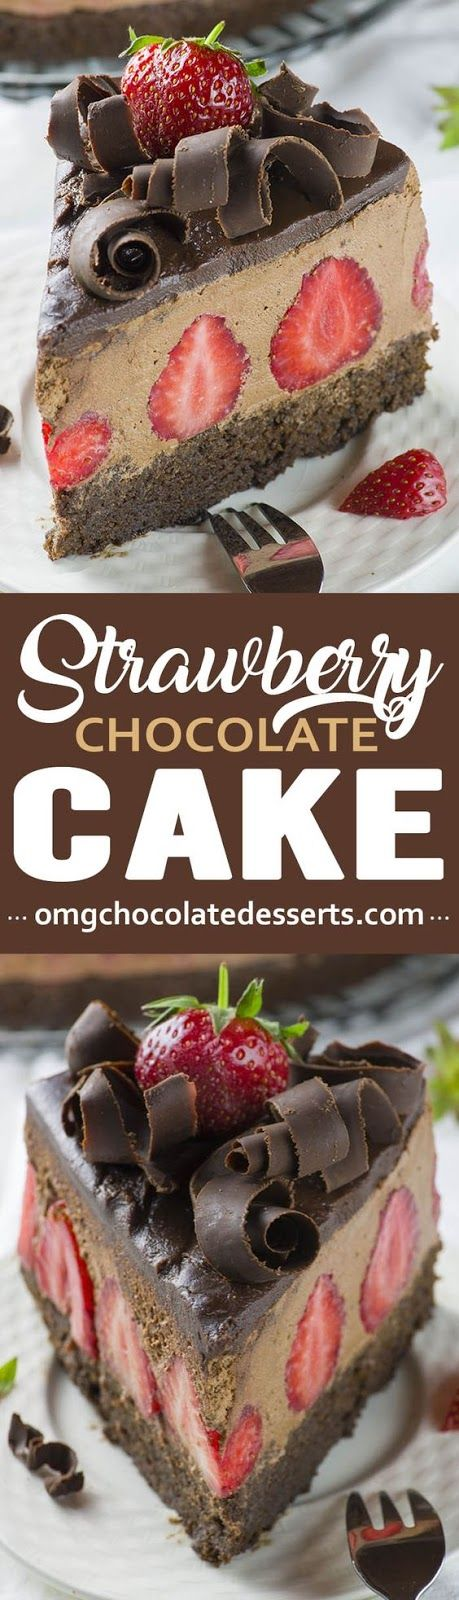 Strawberry Chocolate Cake Chocolate Desserts Cake Chocolate Desserts Chocolate Dessert Recipes